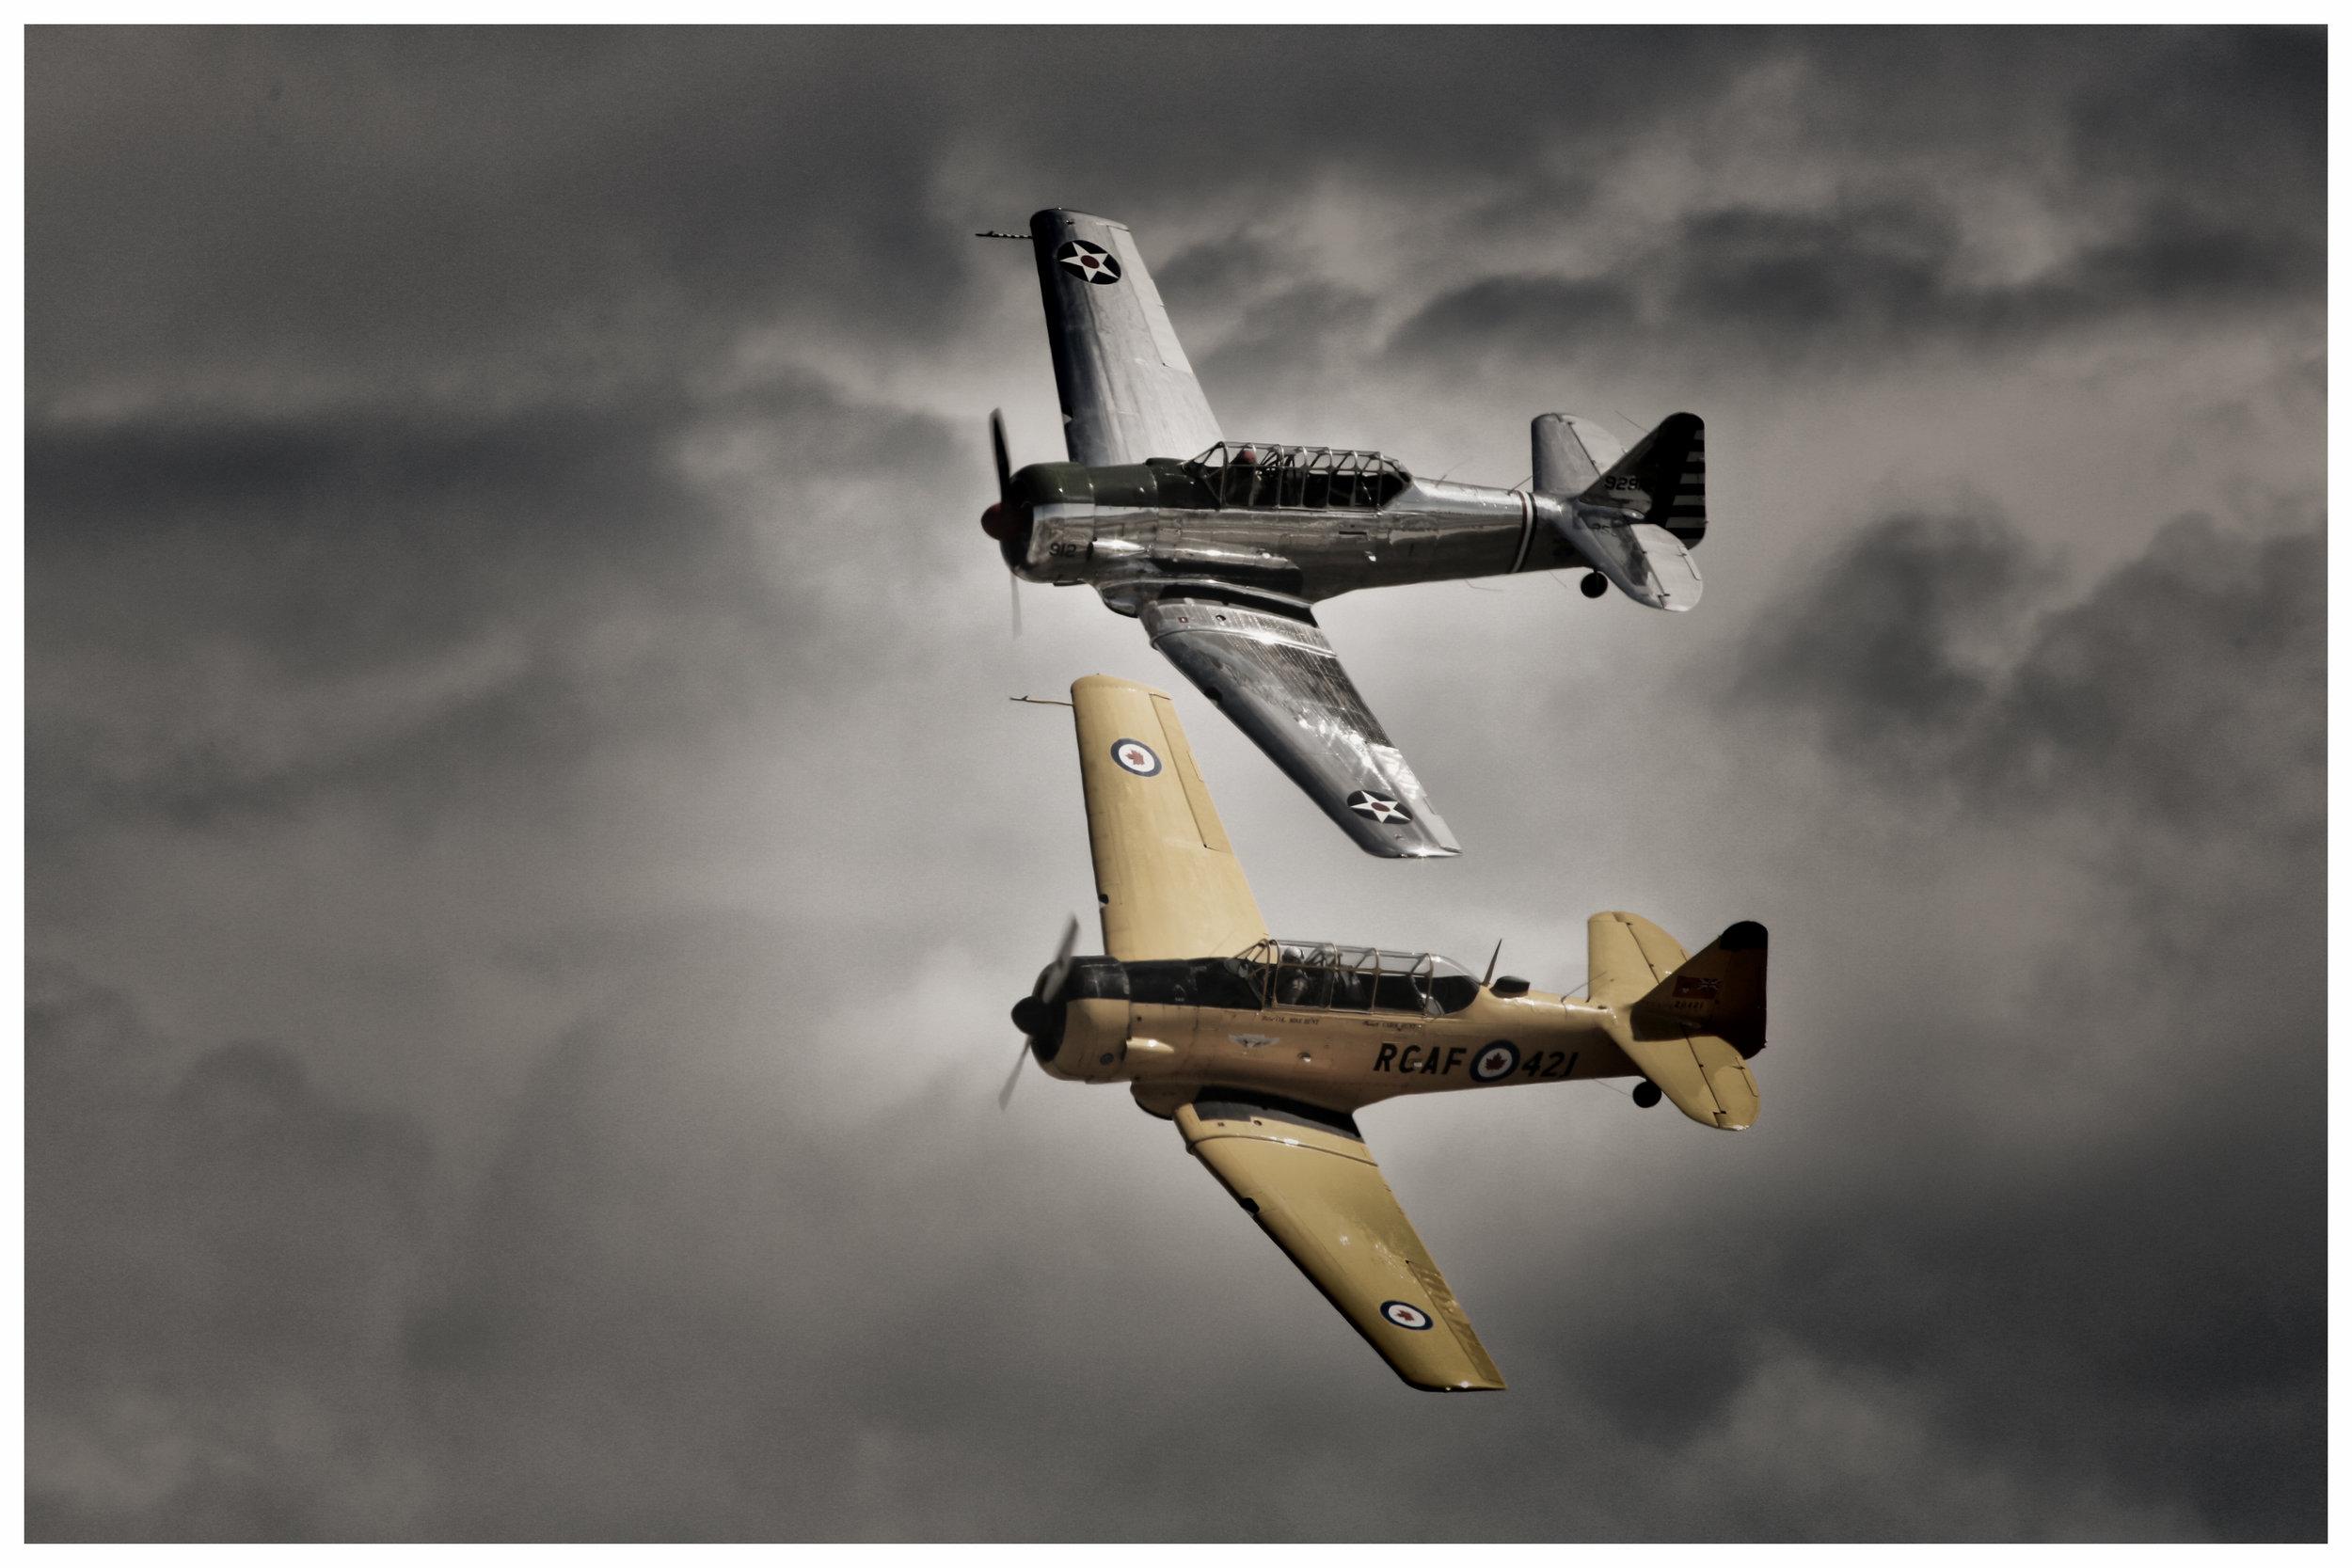 texan training planes.jpg